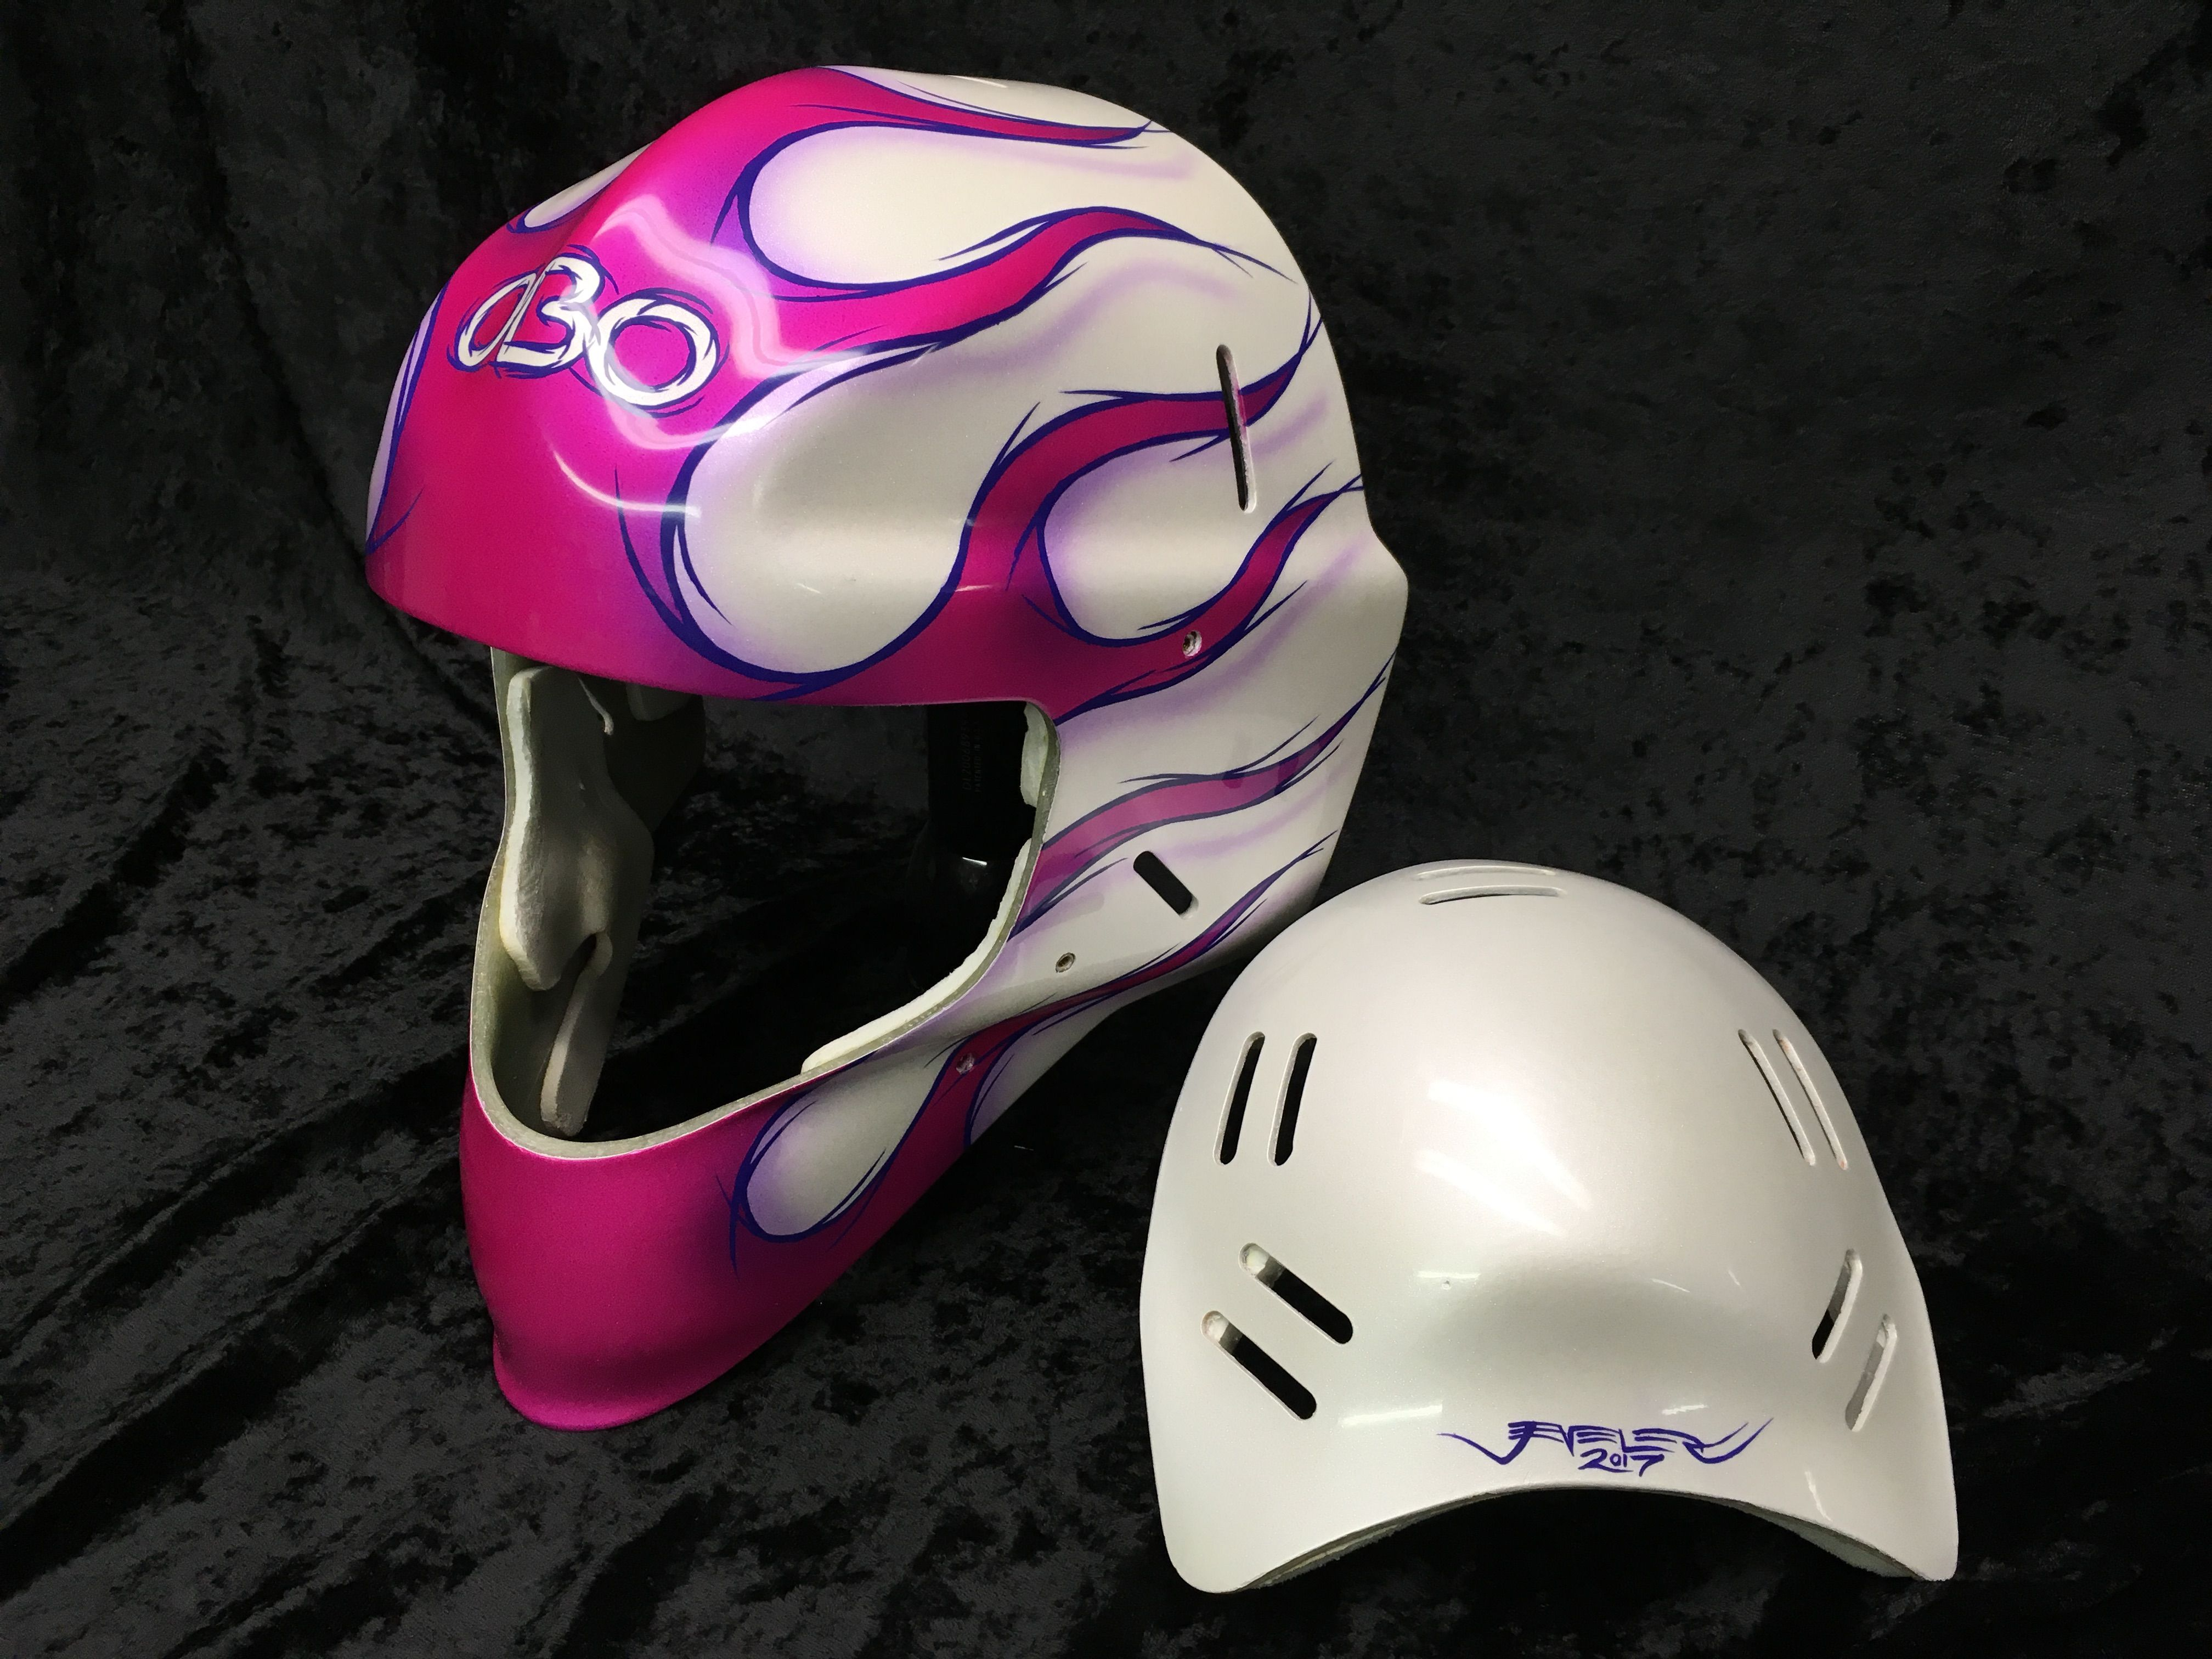 Custom painted goalie helmet helmet helmet paint